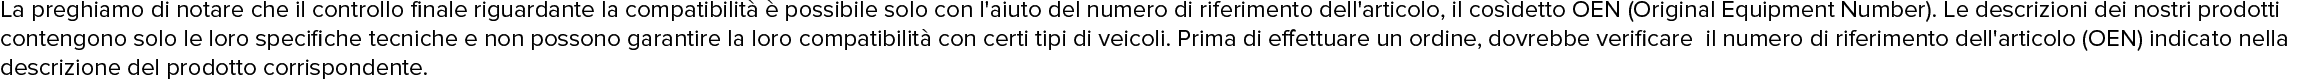 MANN-FILTER 504082382, 84818743, 2943301, 50 01858 099, 50 01863 139 Filtro olio